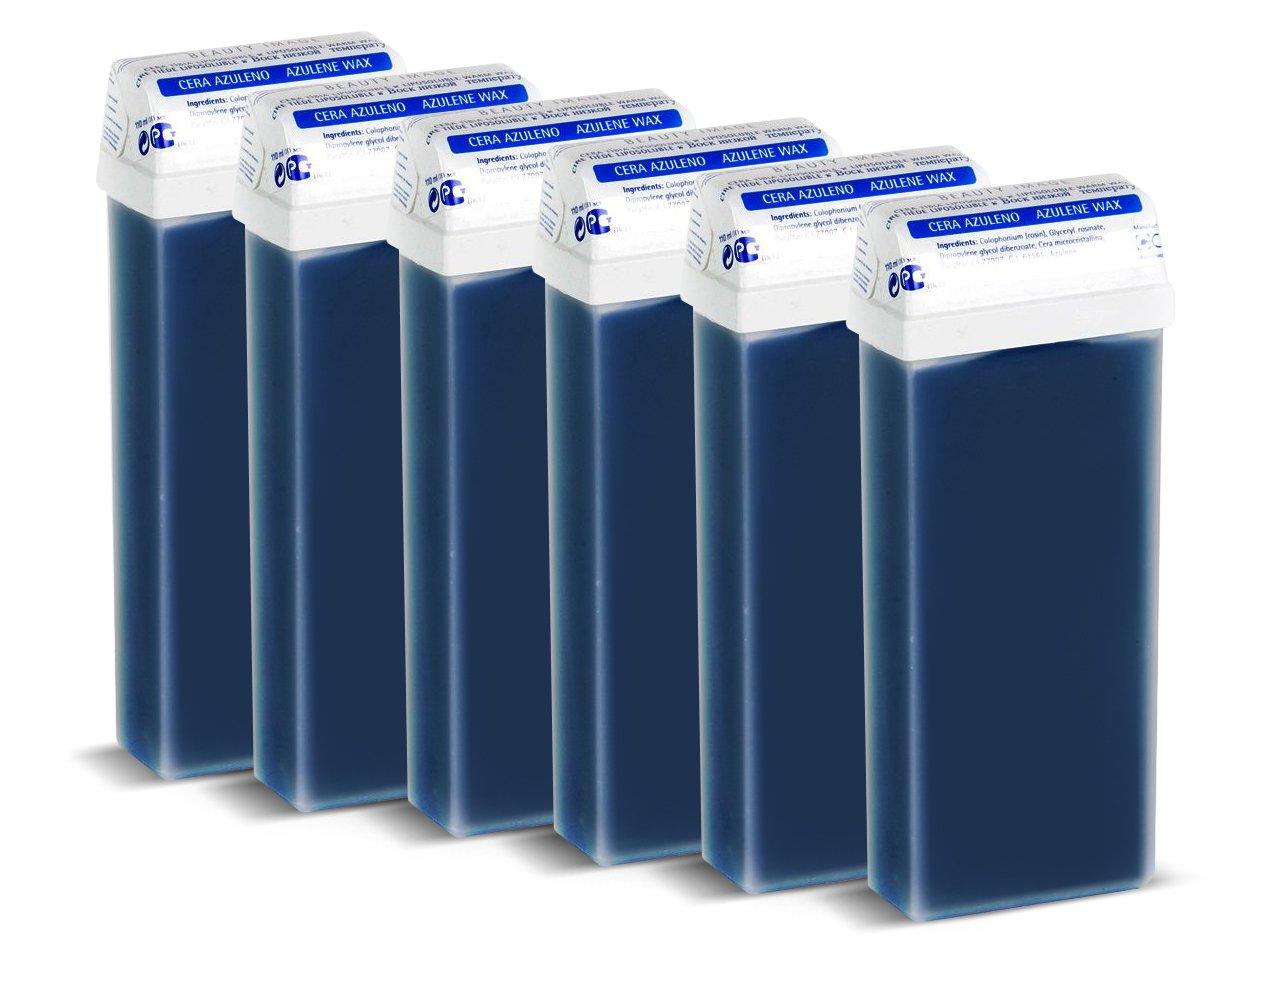 Beauty Image Azulene Warm Wax Roll On - Pack of 6 BeautyCentre 100001x6